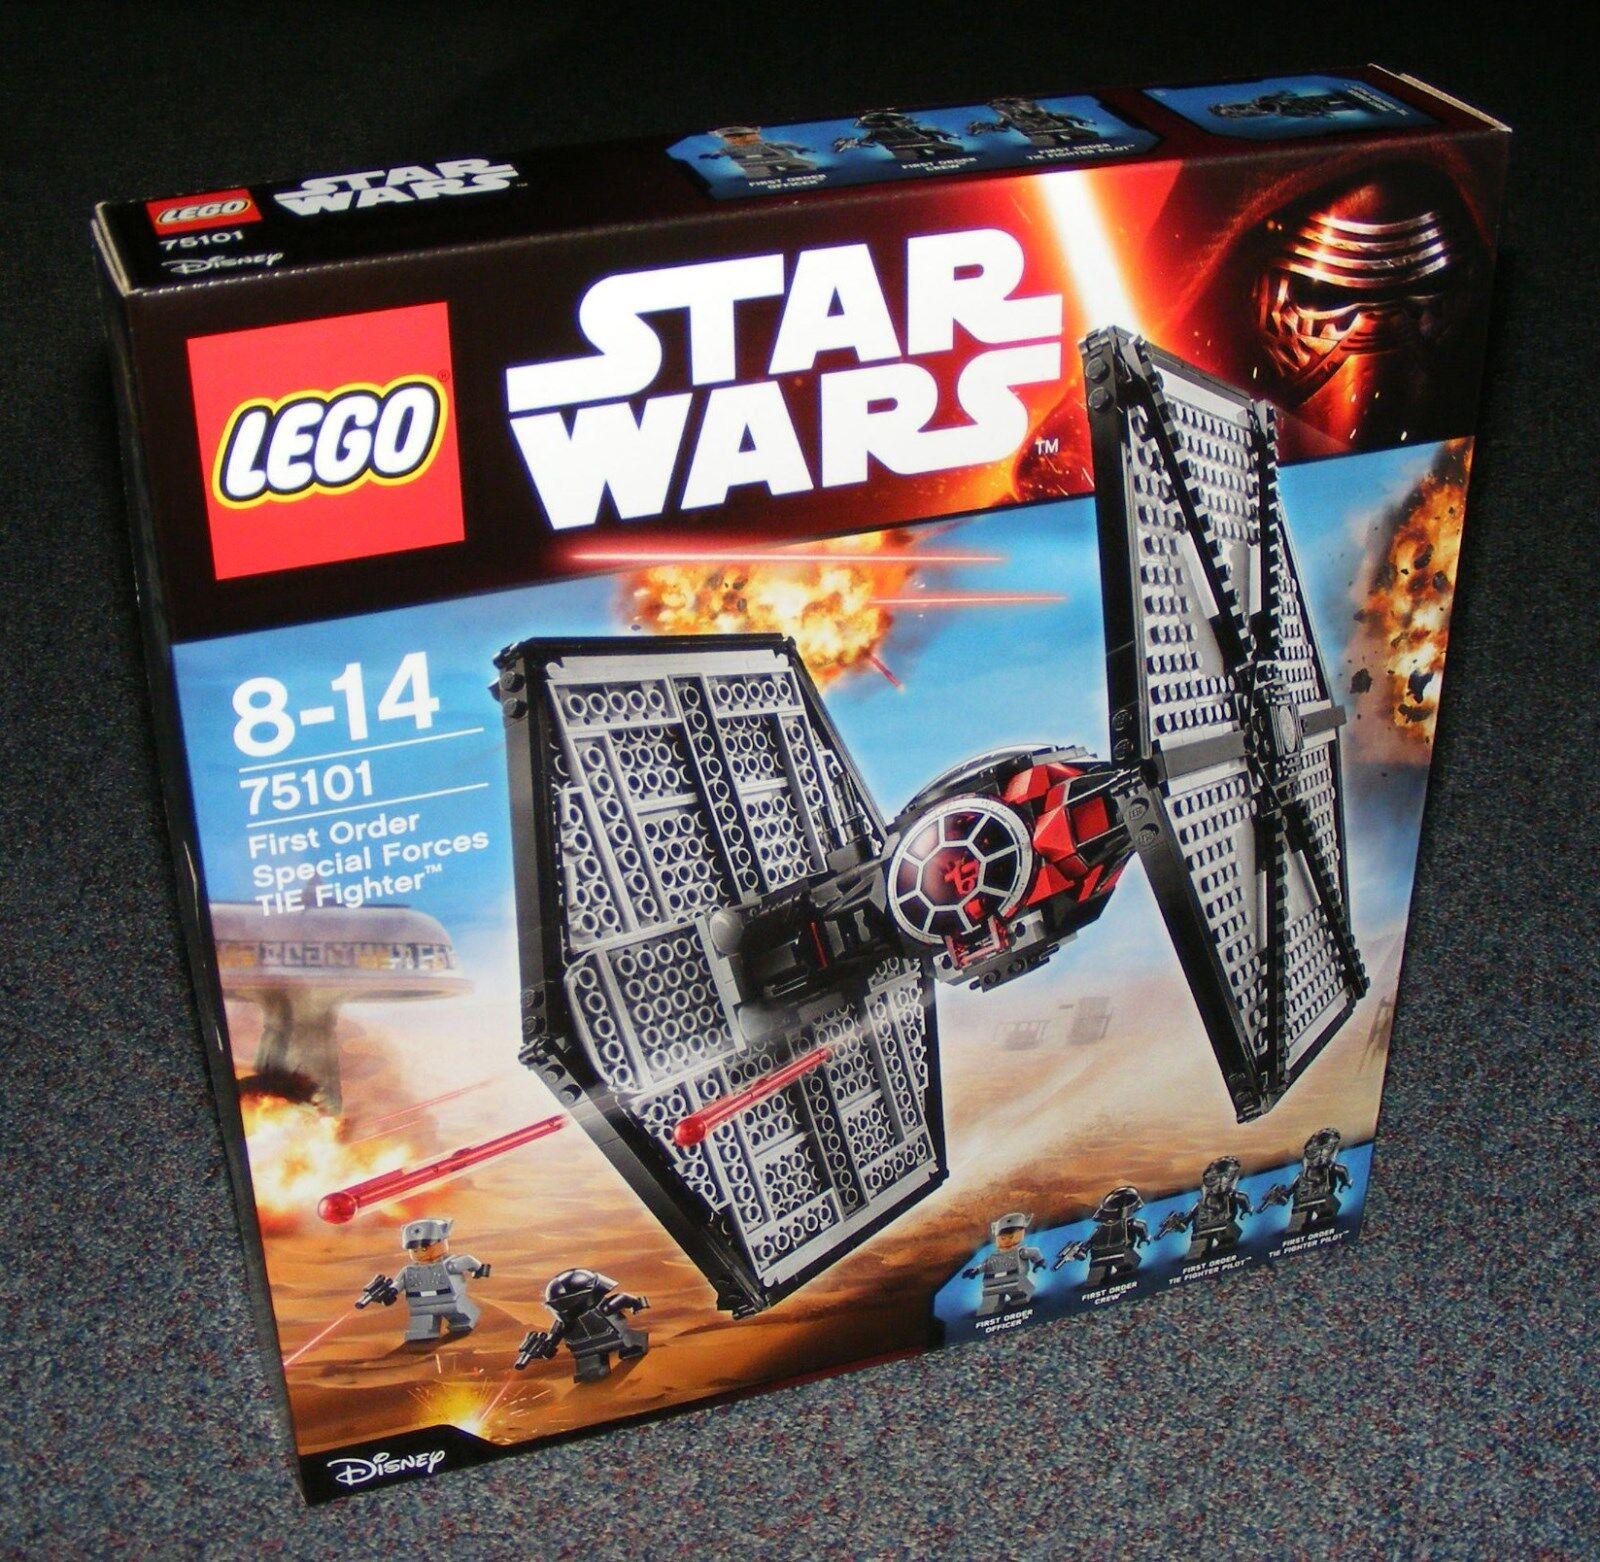 STAR WARS LEGO 75101 FIRST ORDER TIE FIGHTER BRAND NEW SEALED BNIB